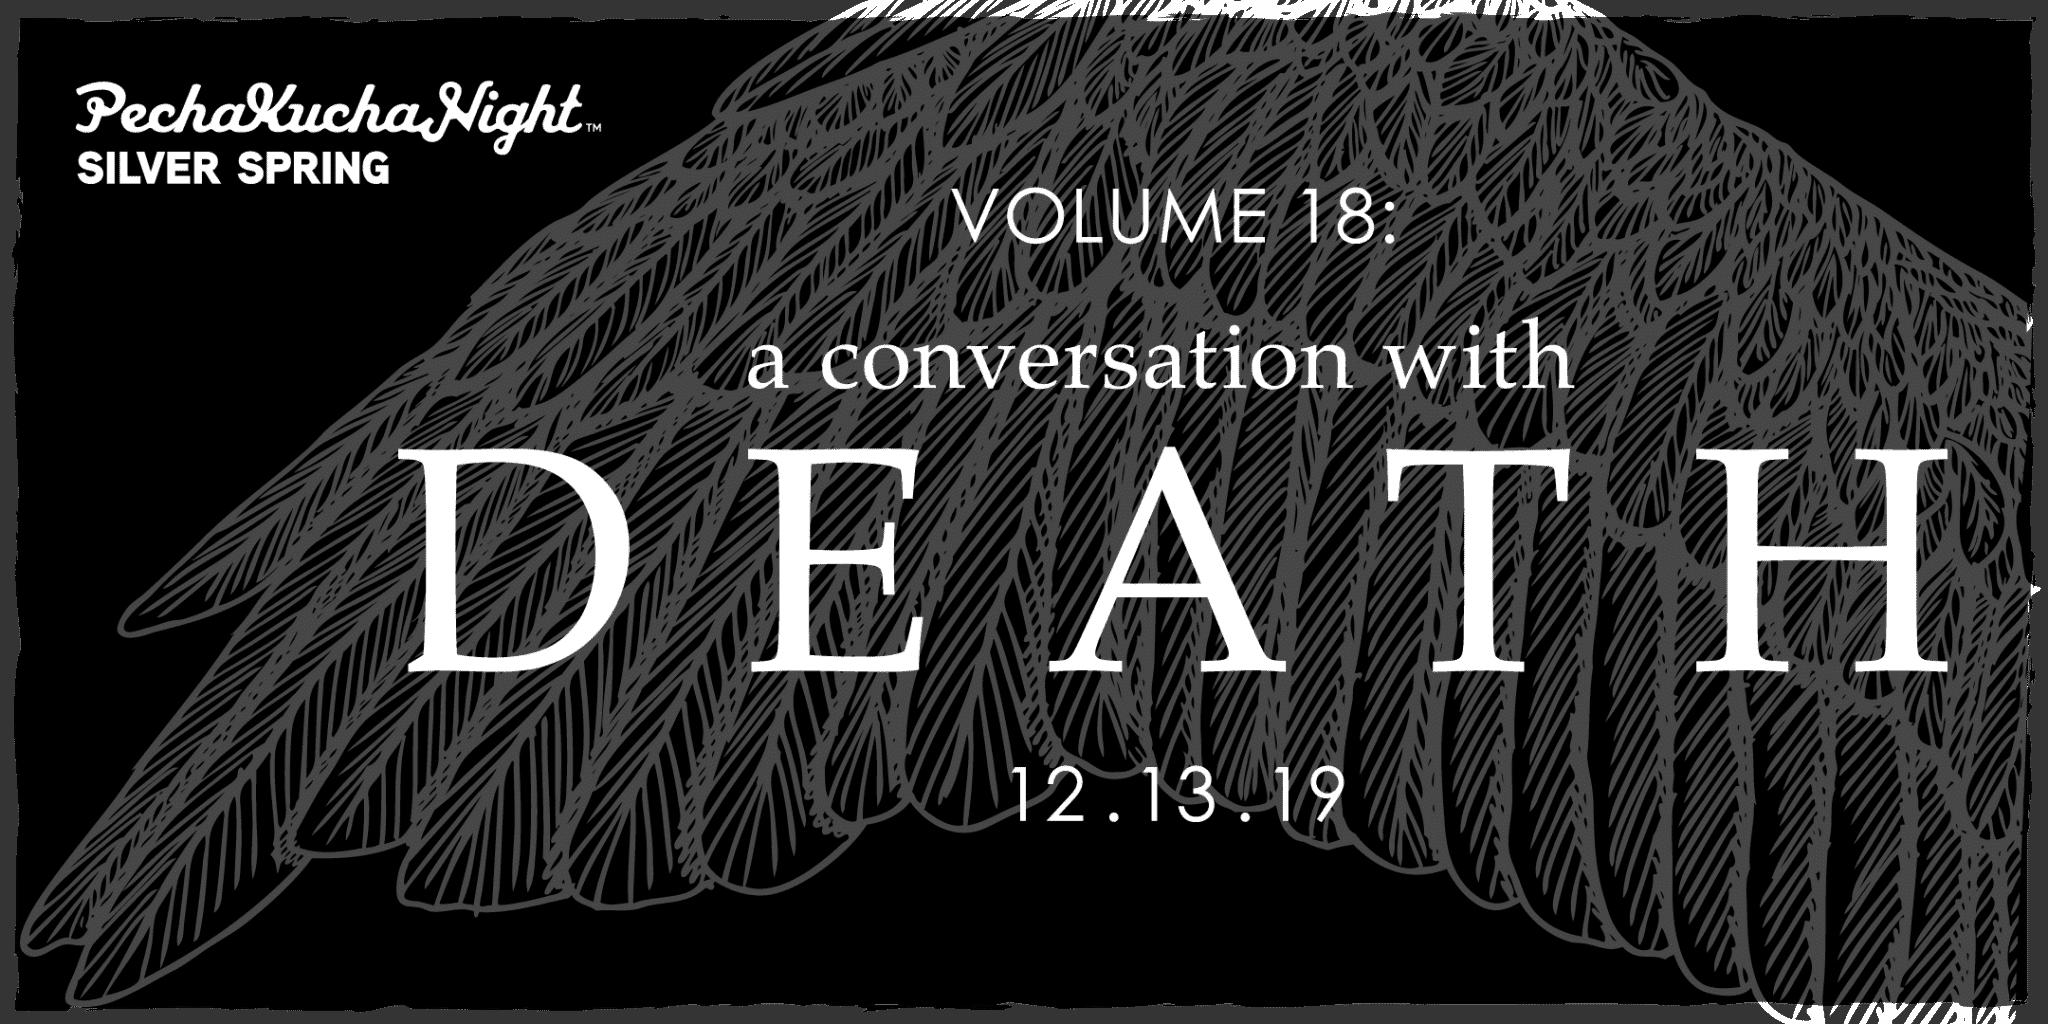 PechaKucha Volume 18: A conversation with Death...